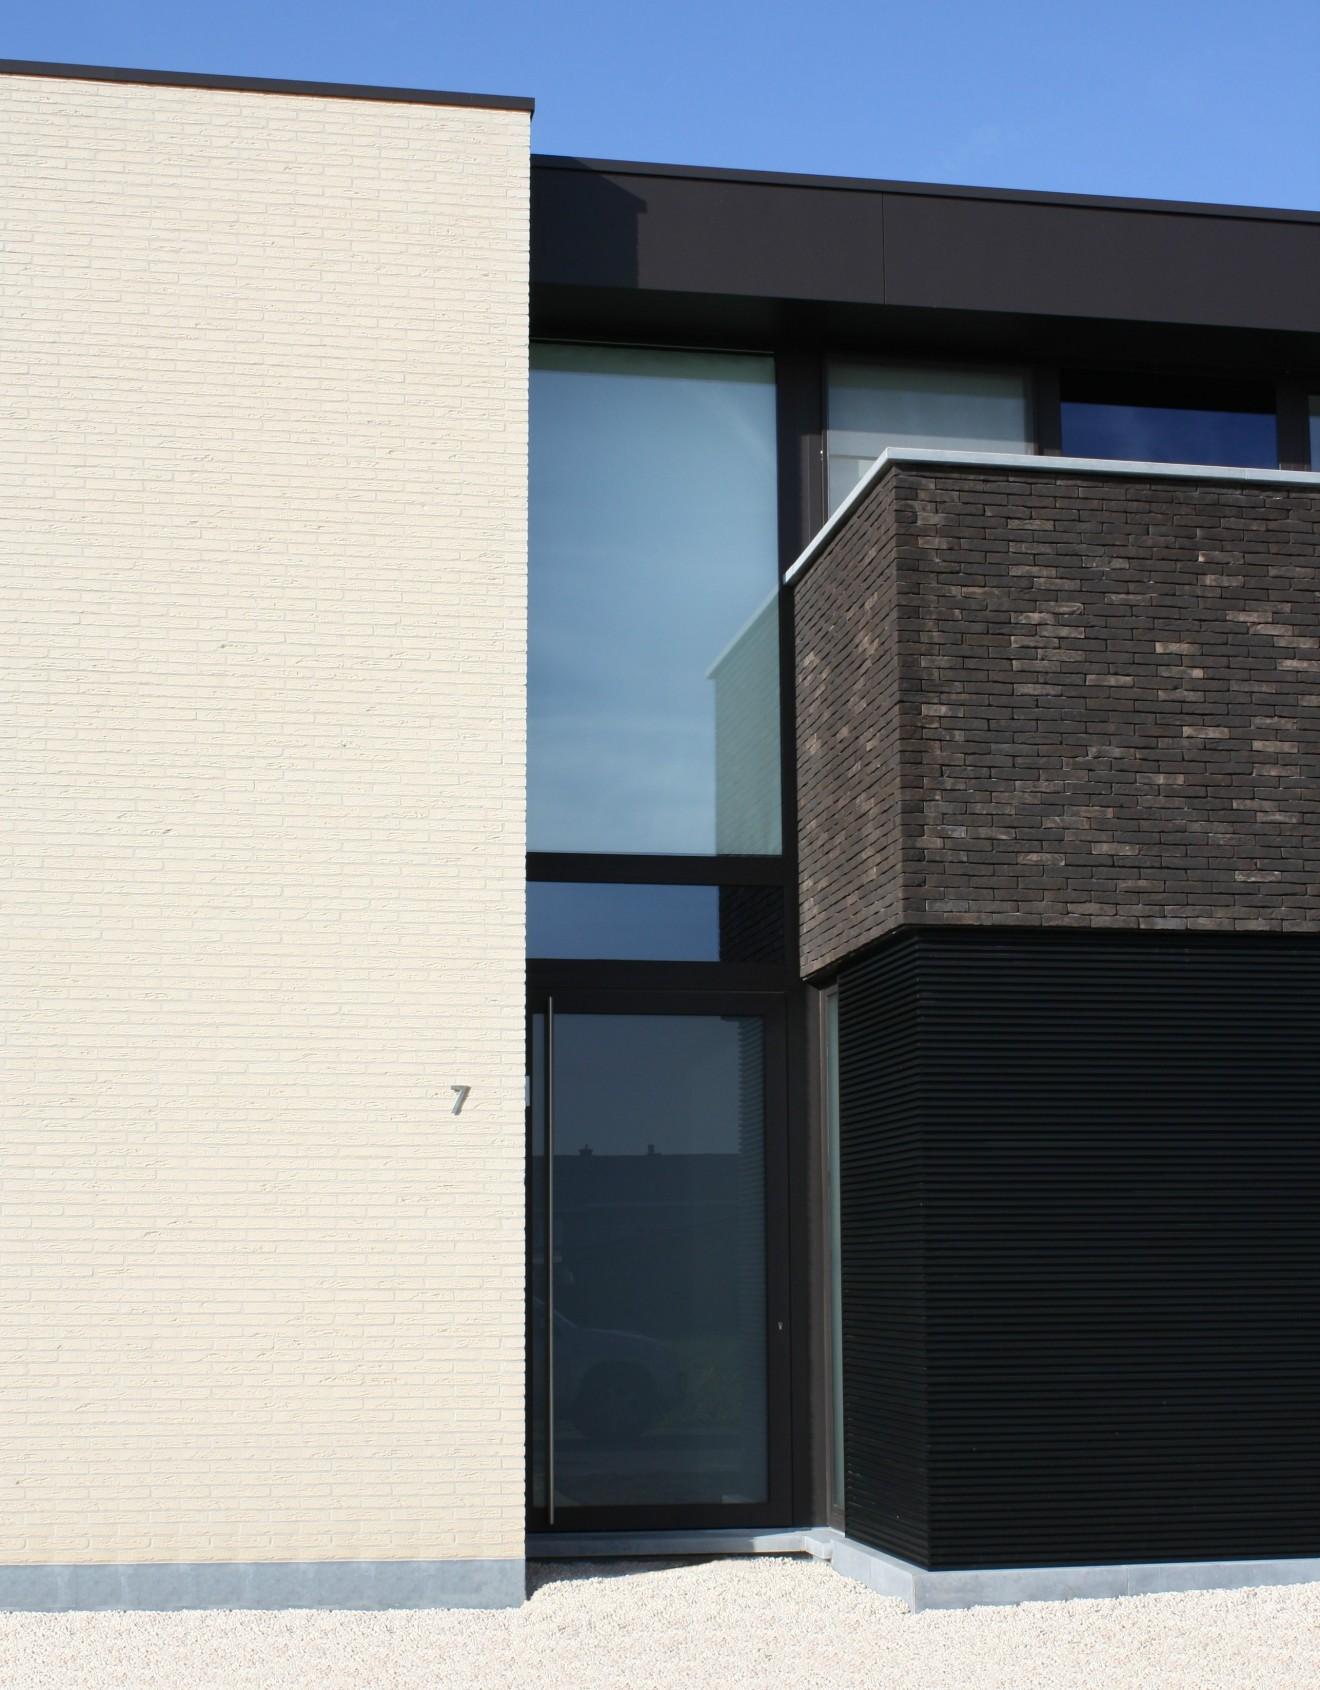 Architect- en ingenieursbureau Andries & Vuylsteke - Nieuwbouwwoning  Merelbeke